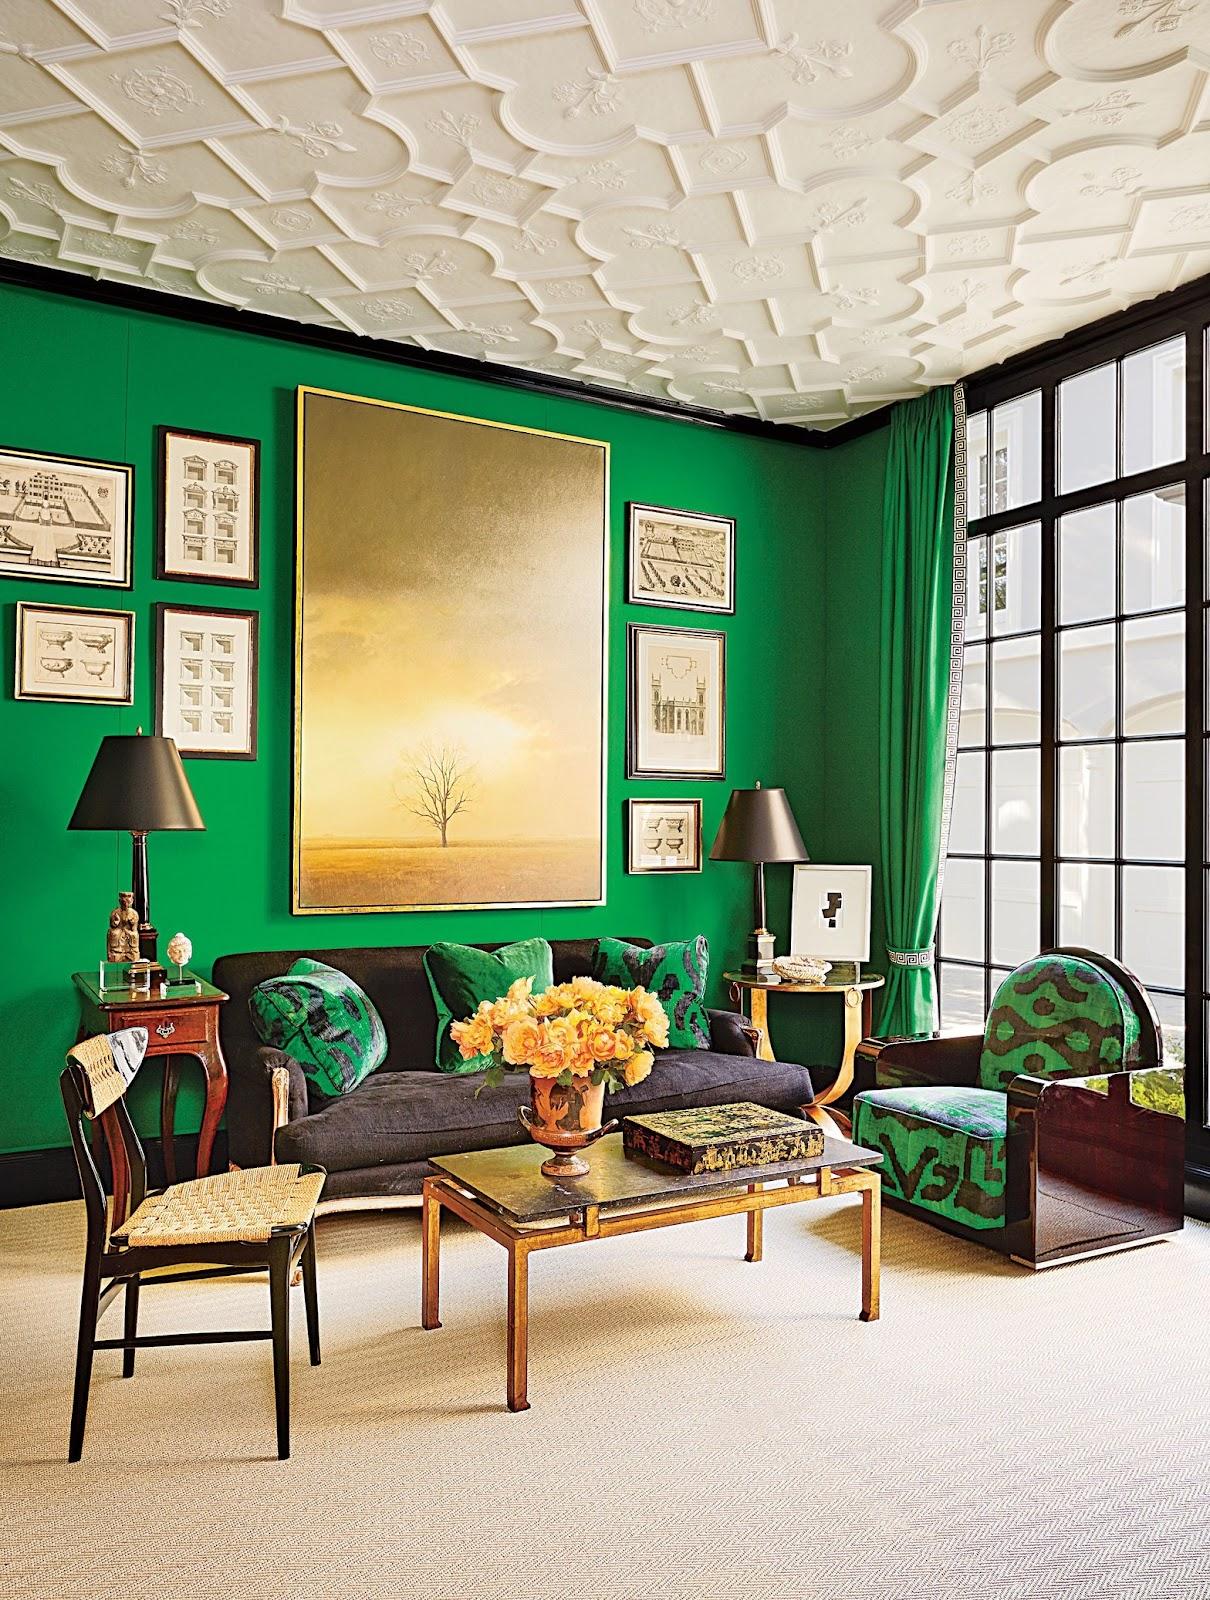 Penggunaan warna terang pada hunian bergaya interior art deco - source: architecturaldigest.com